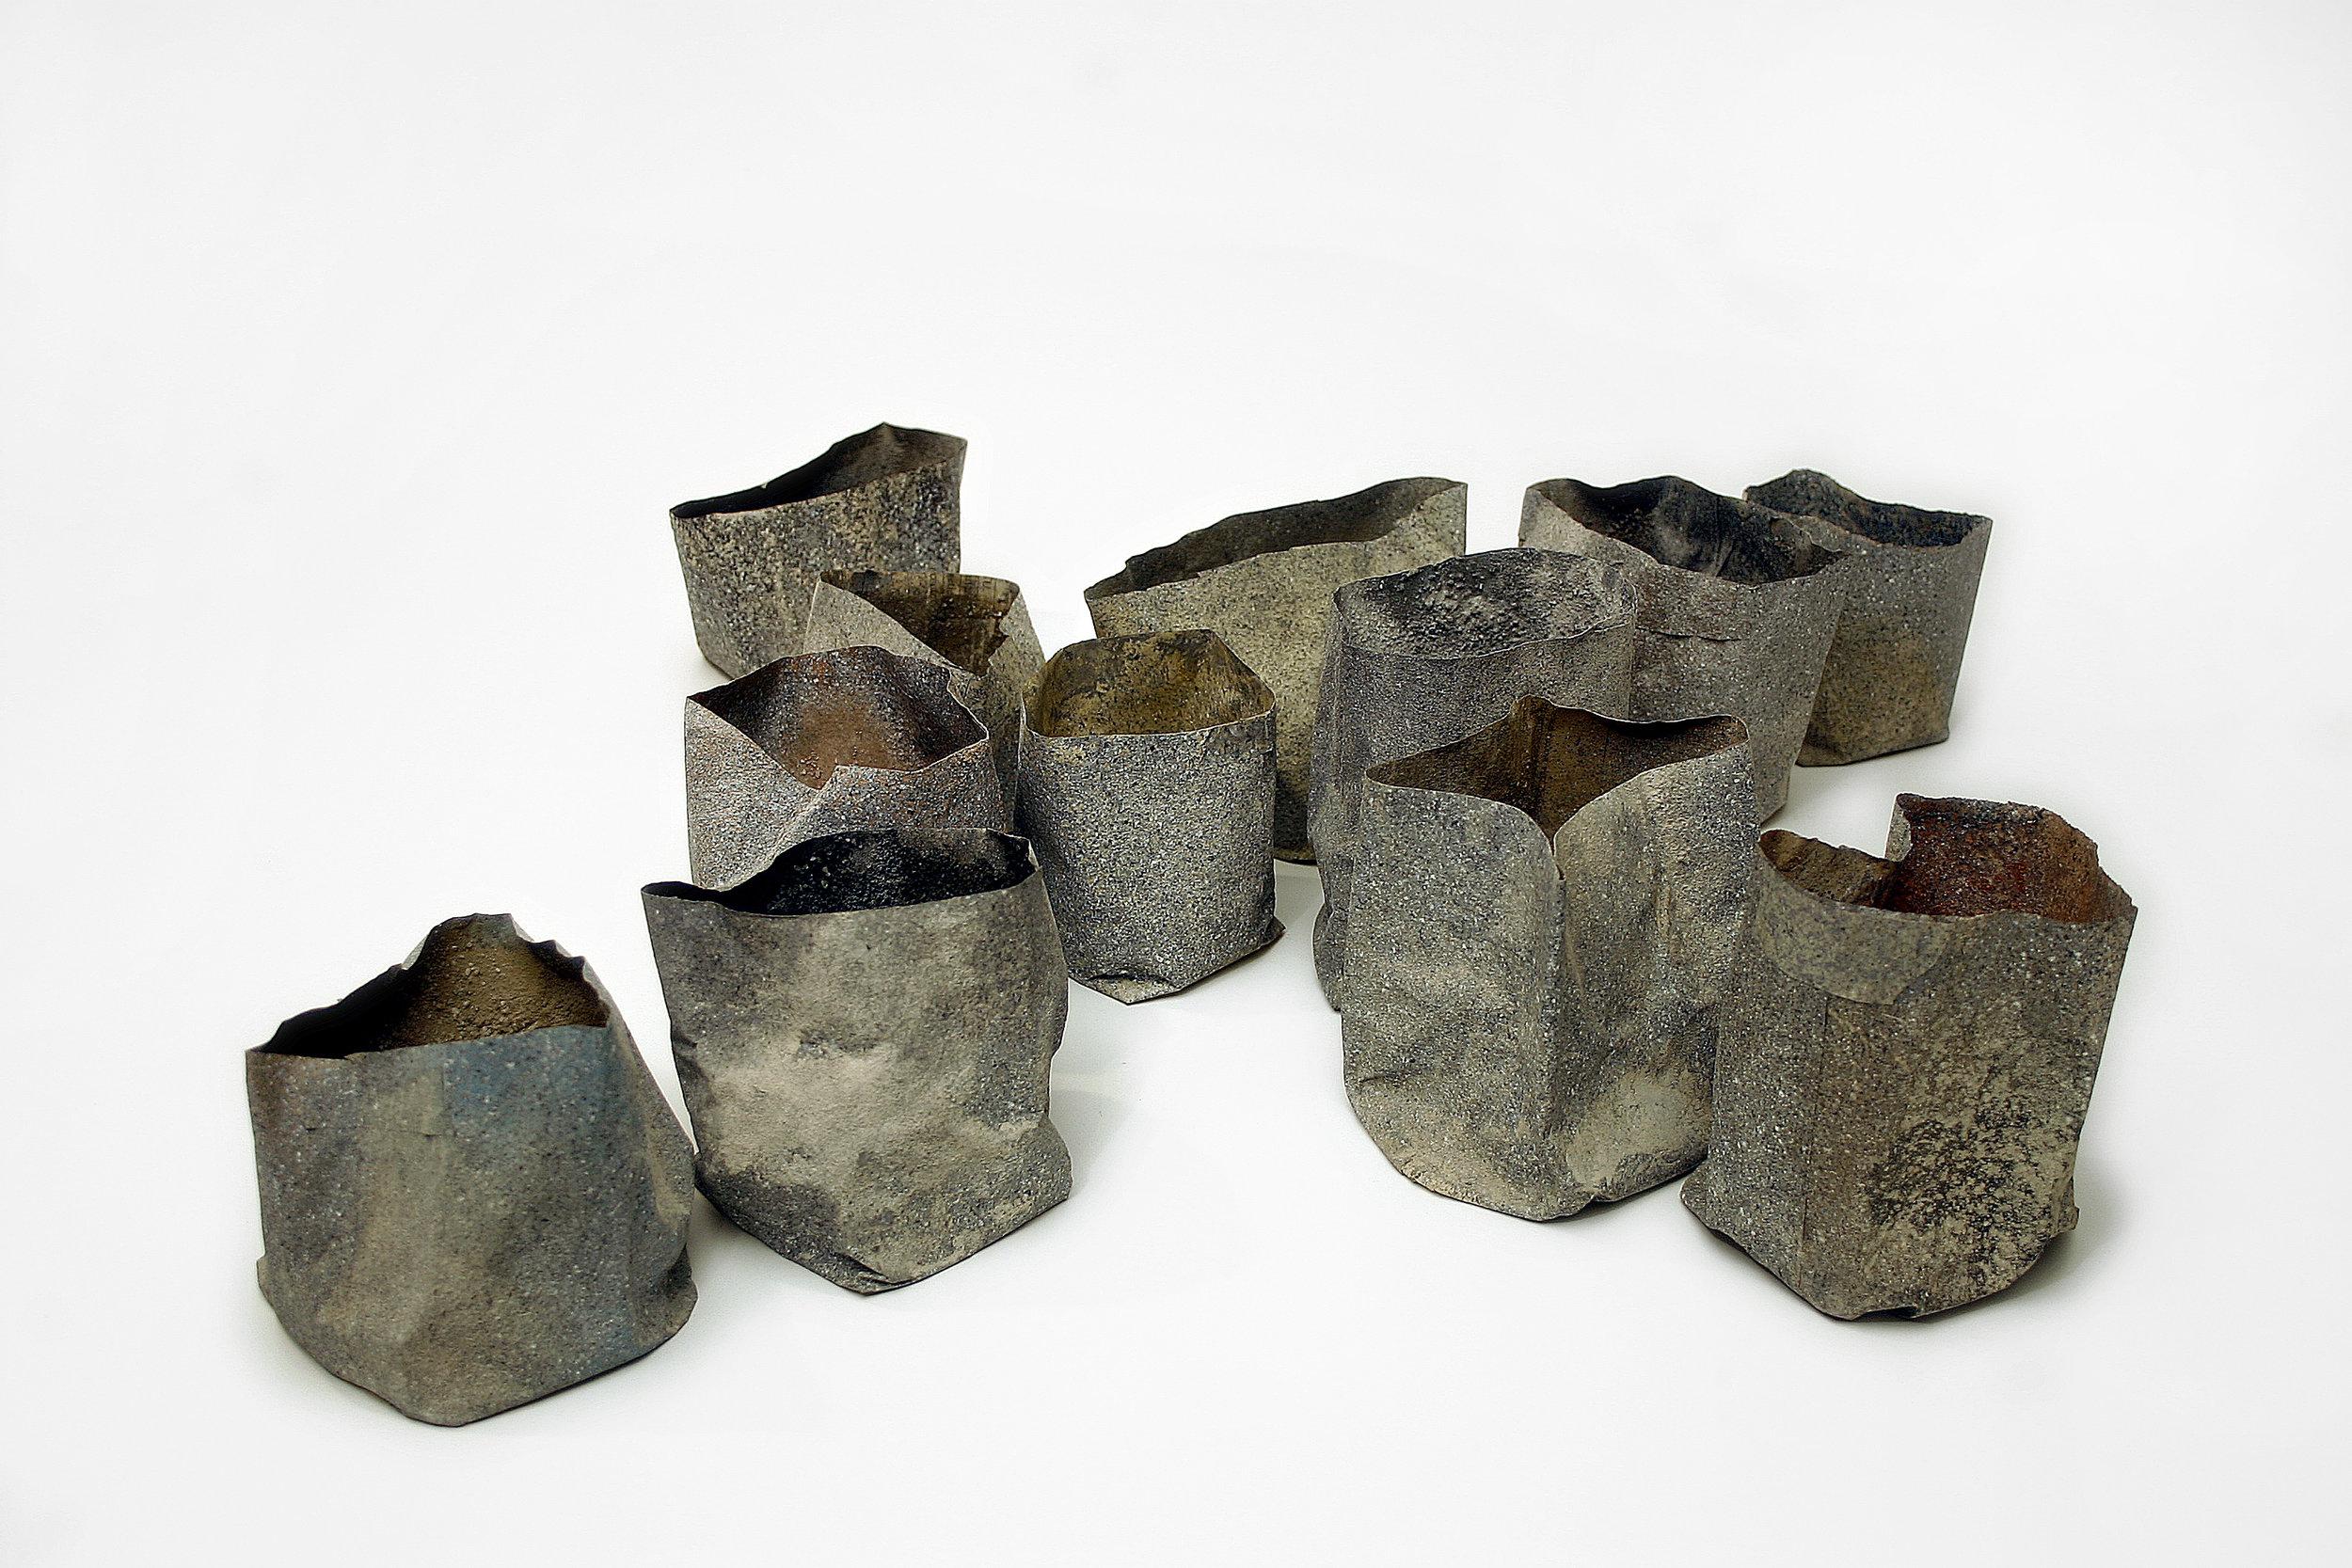 08.-Furriols 'ST' 2002 (13,5x59x58,5cm).jpg